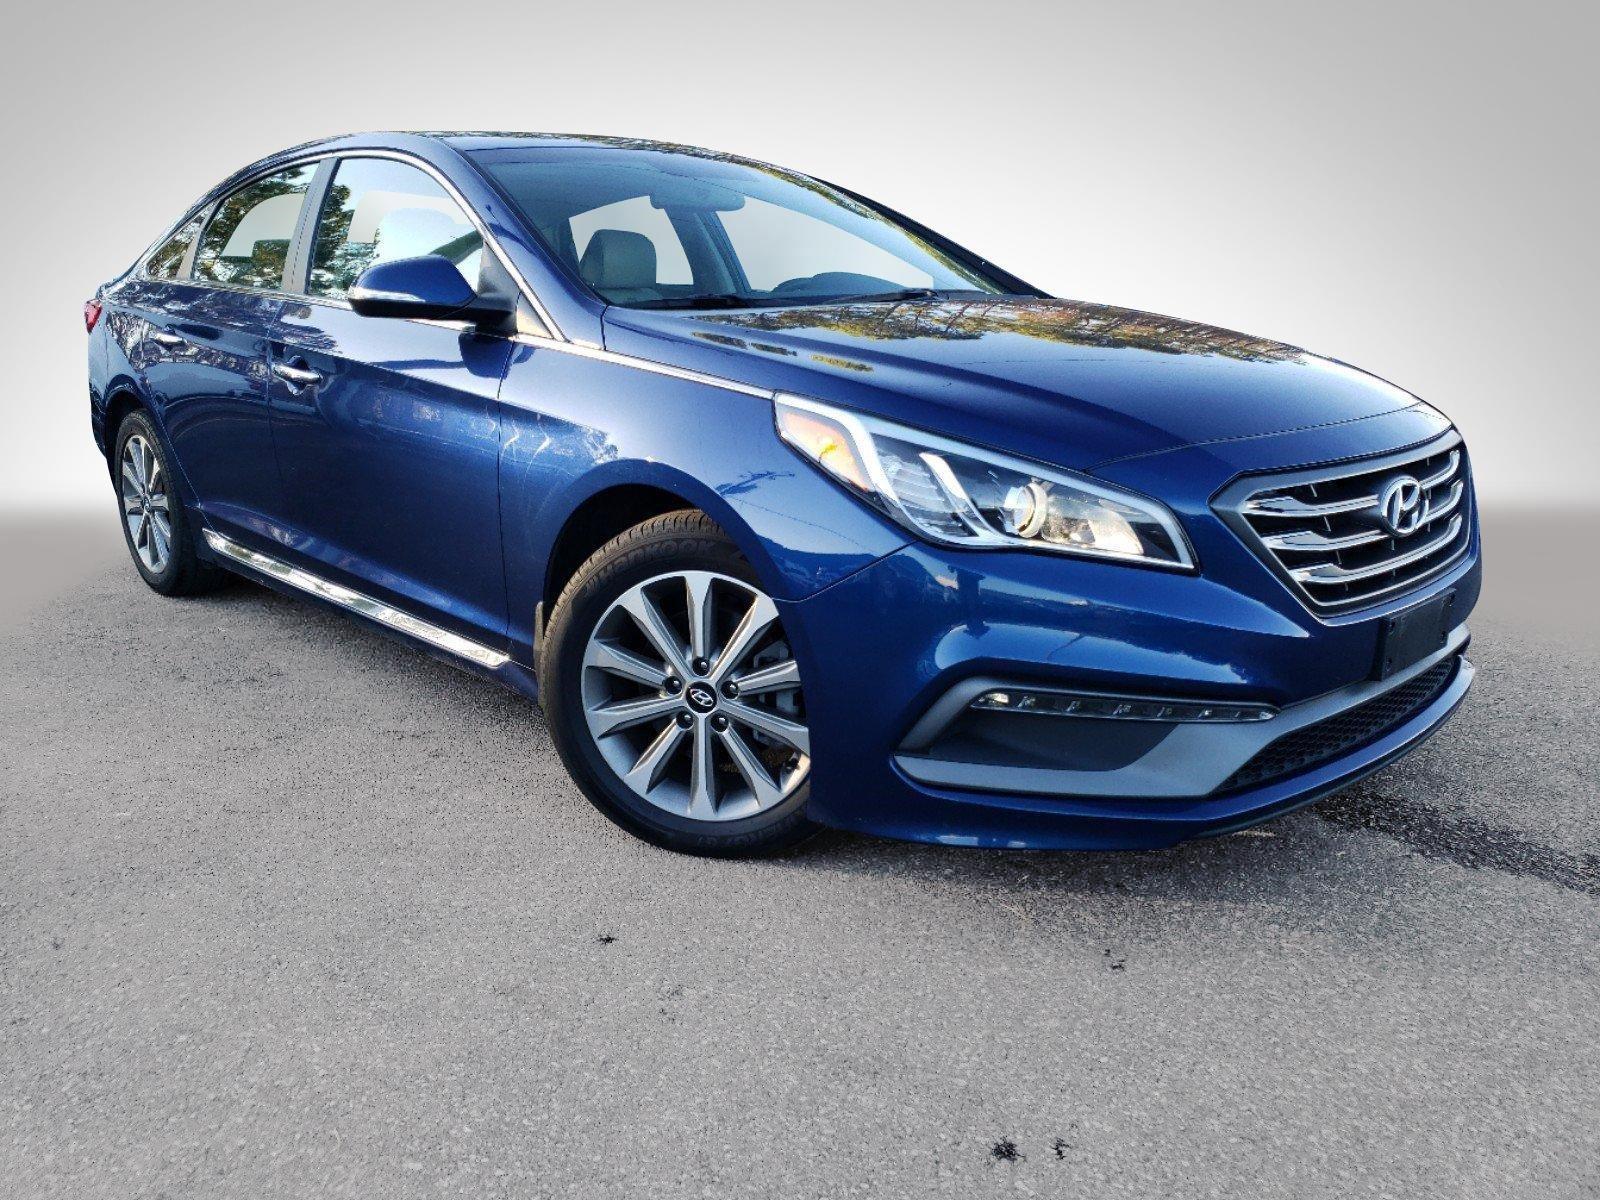 Pre-Owned 2017 Hyundai Sonata Limited